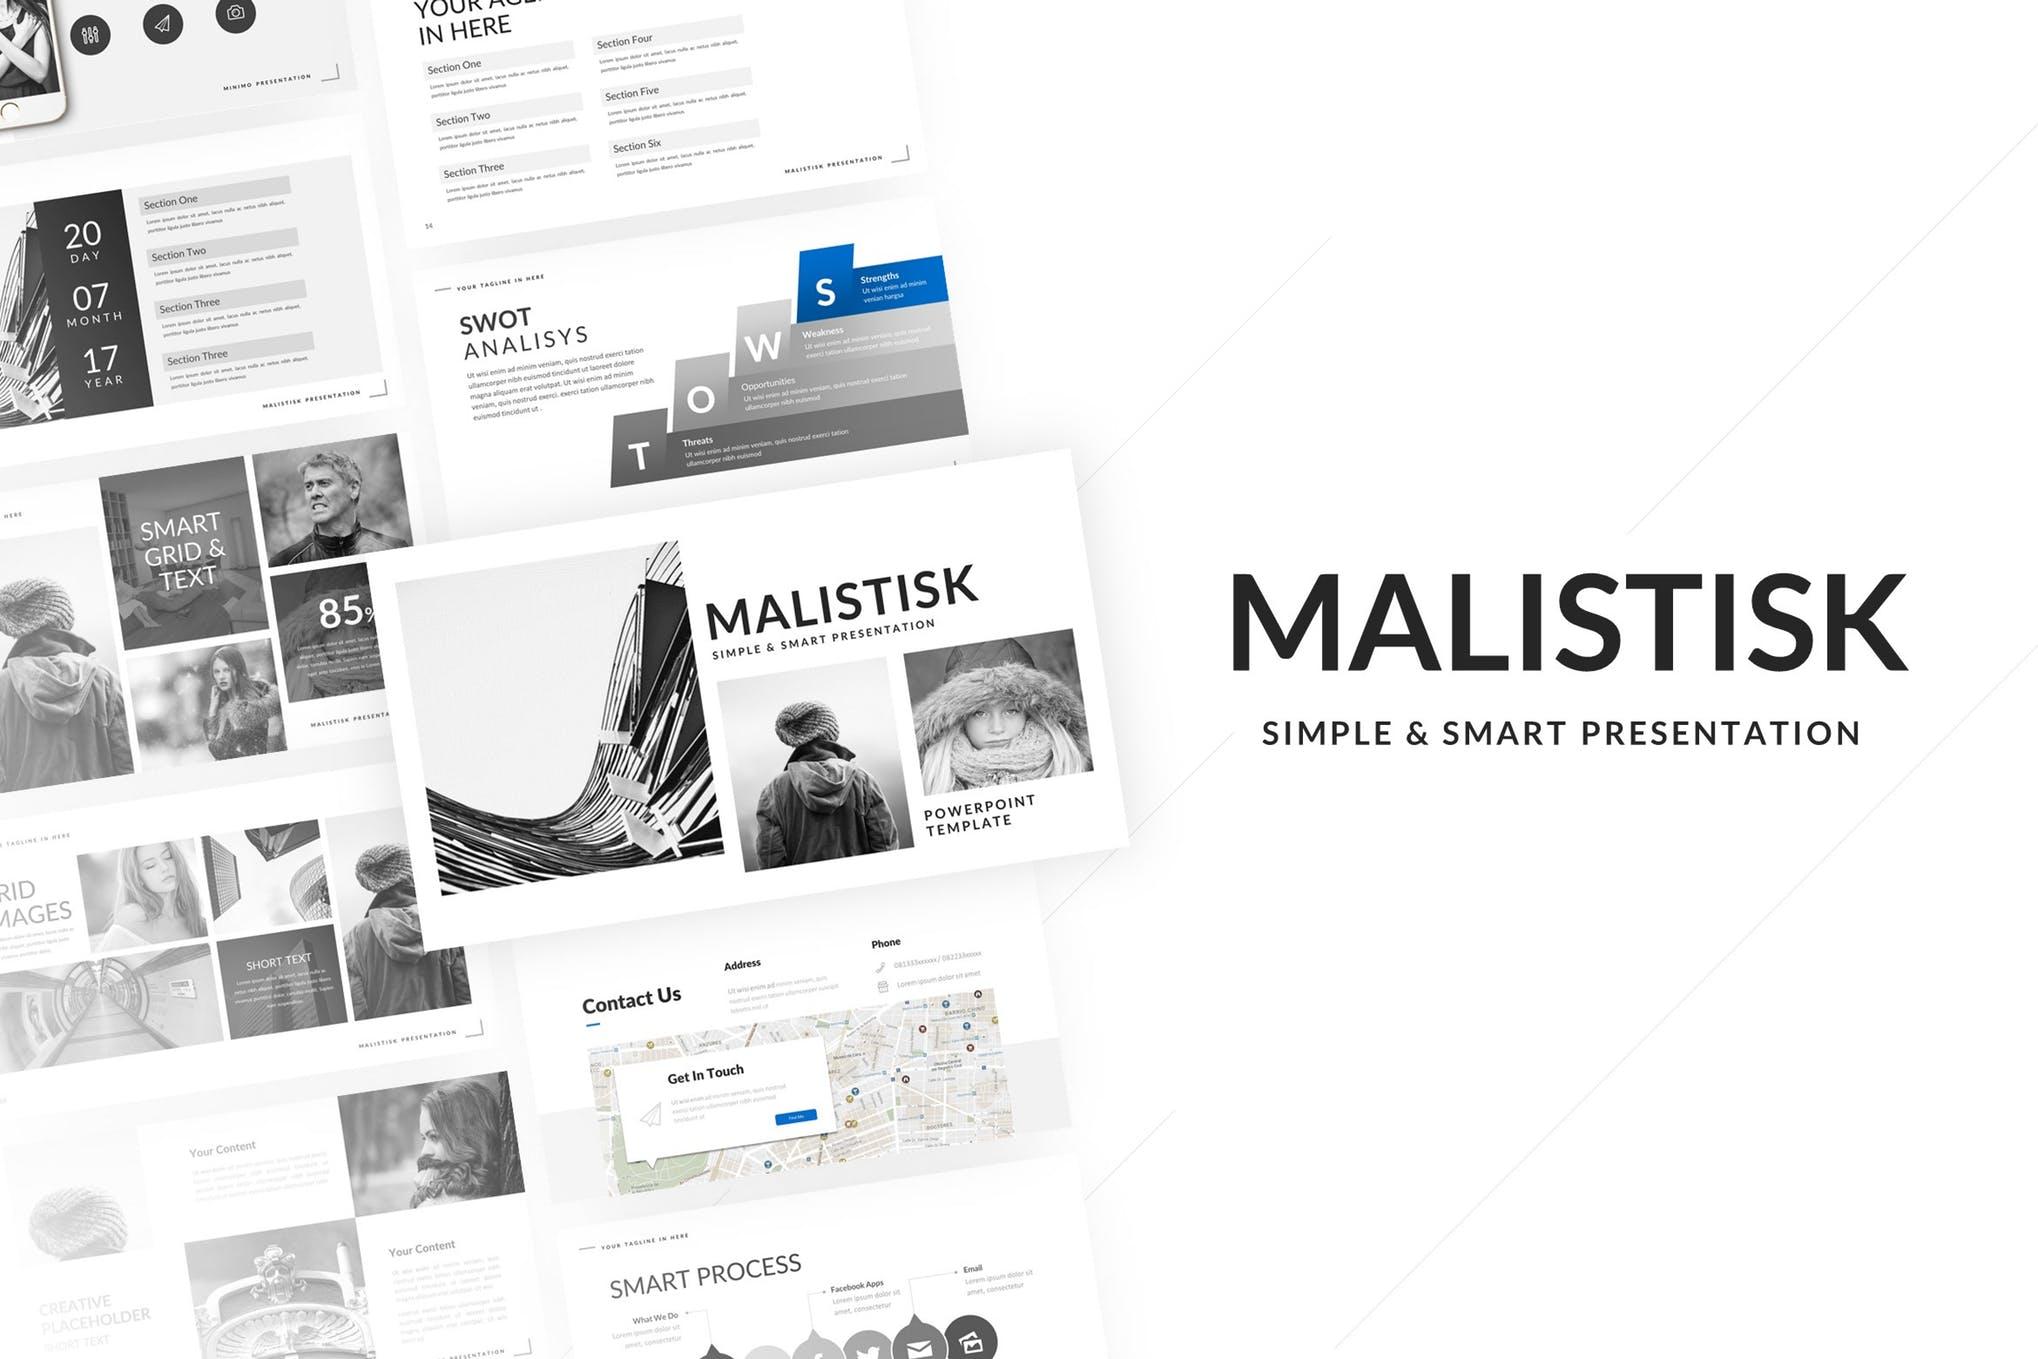 Malistisk Powerpoint Presentation Template